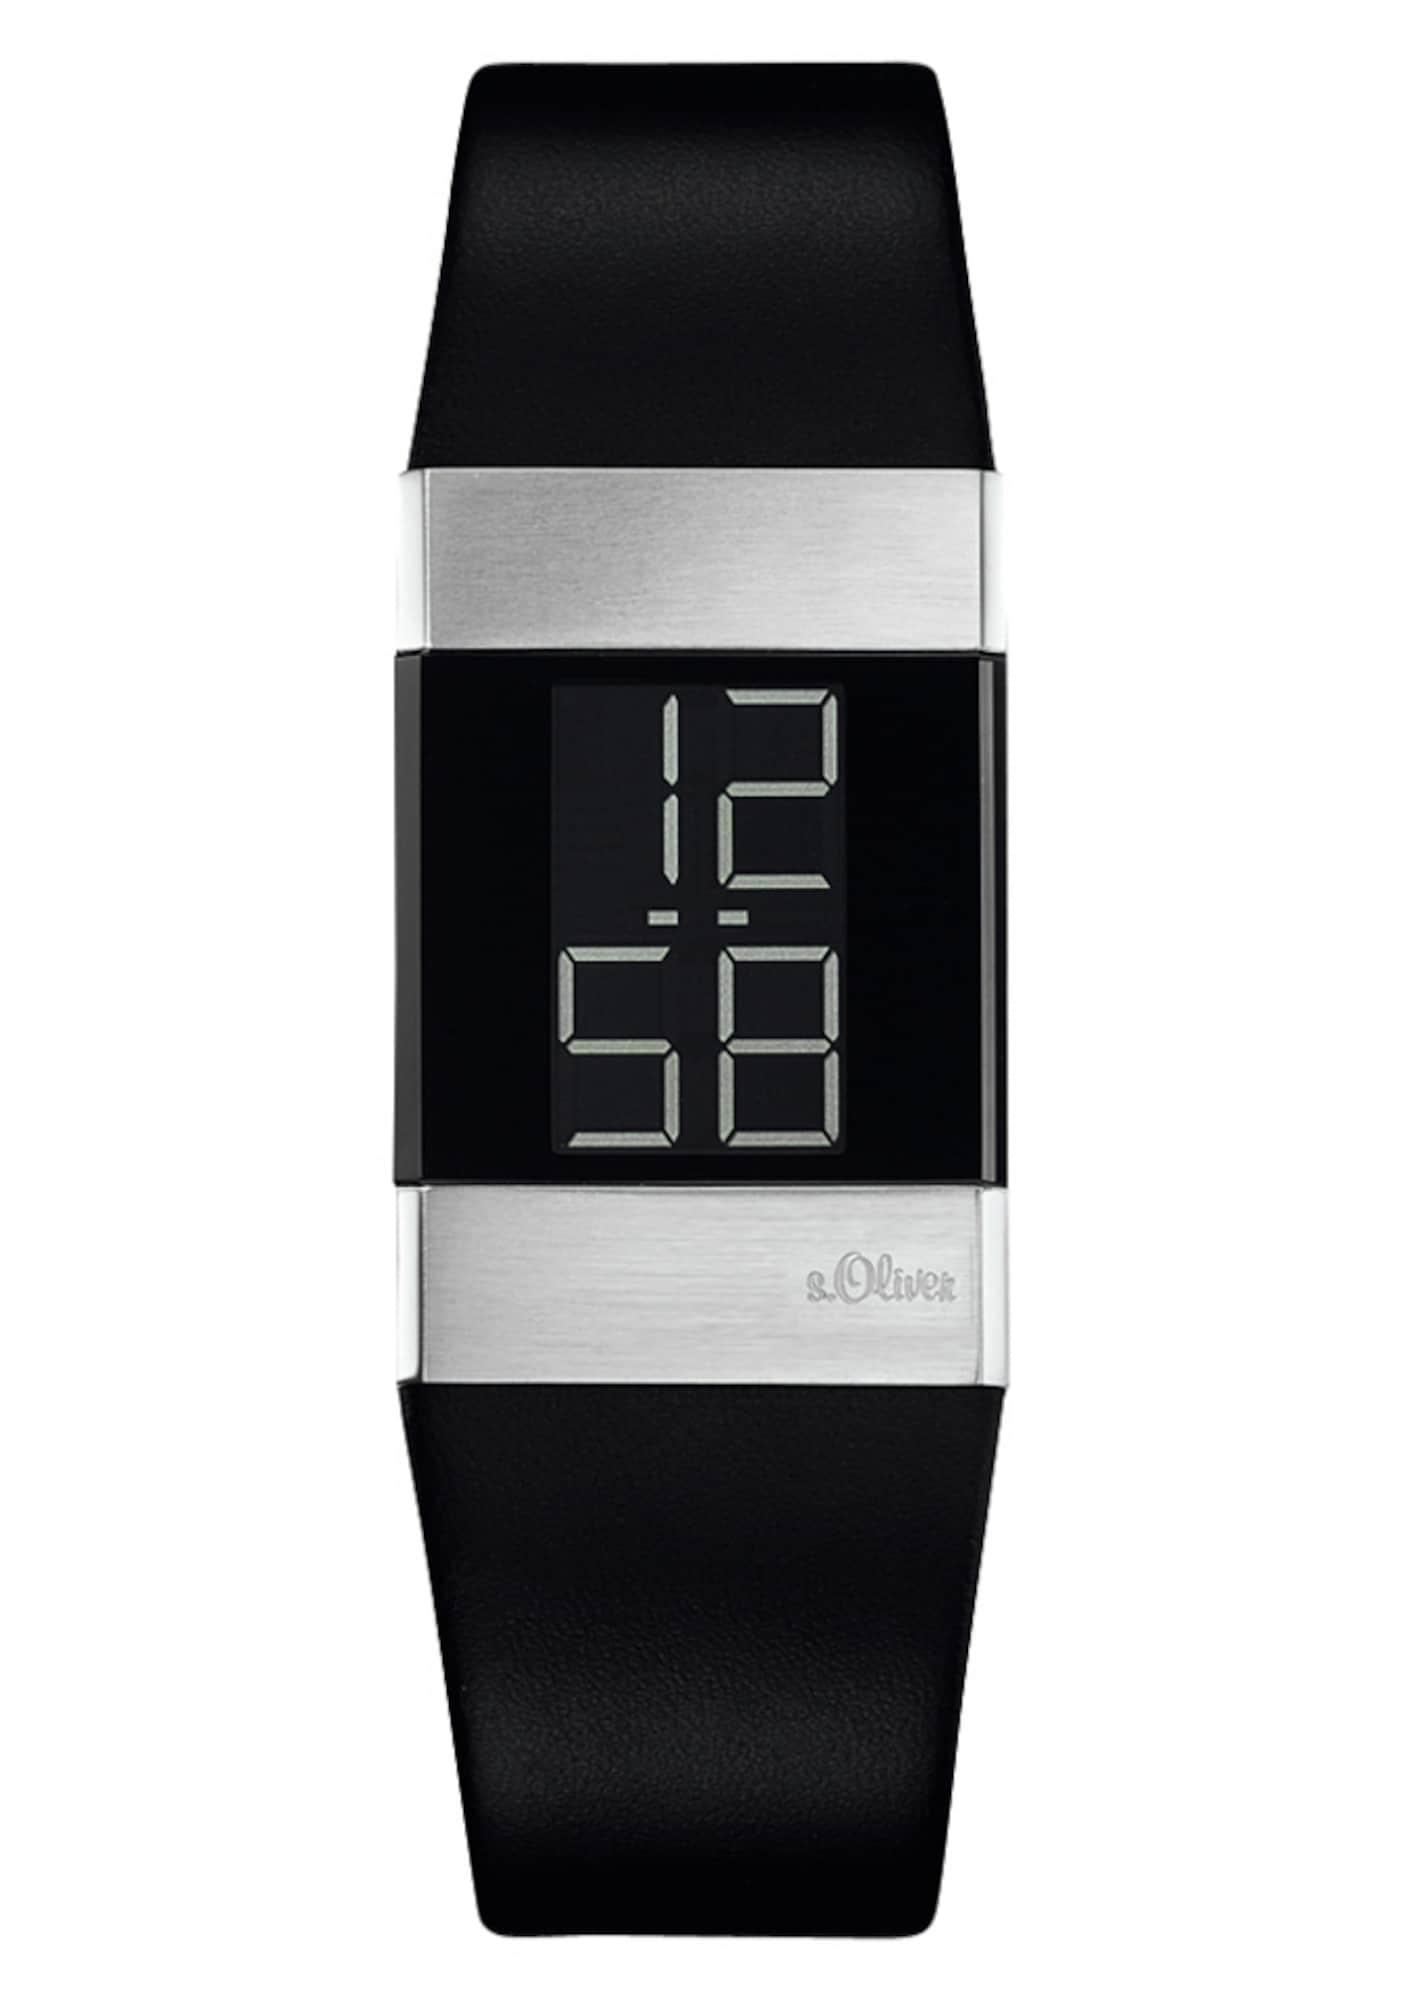 Armbanduhr | Uhren > Sonstige Armbanduhren | Silbergrau - Schwarz | S.Oliver